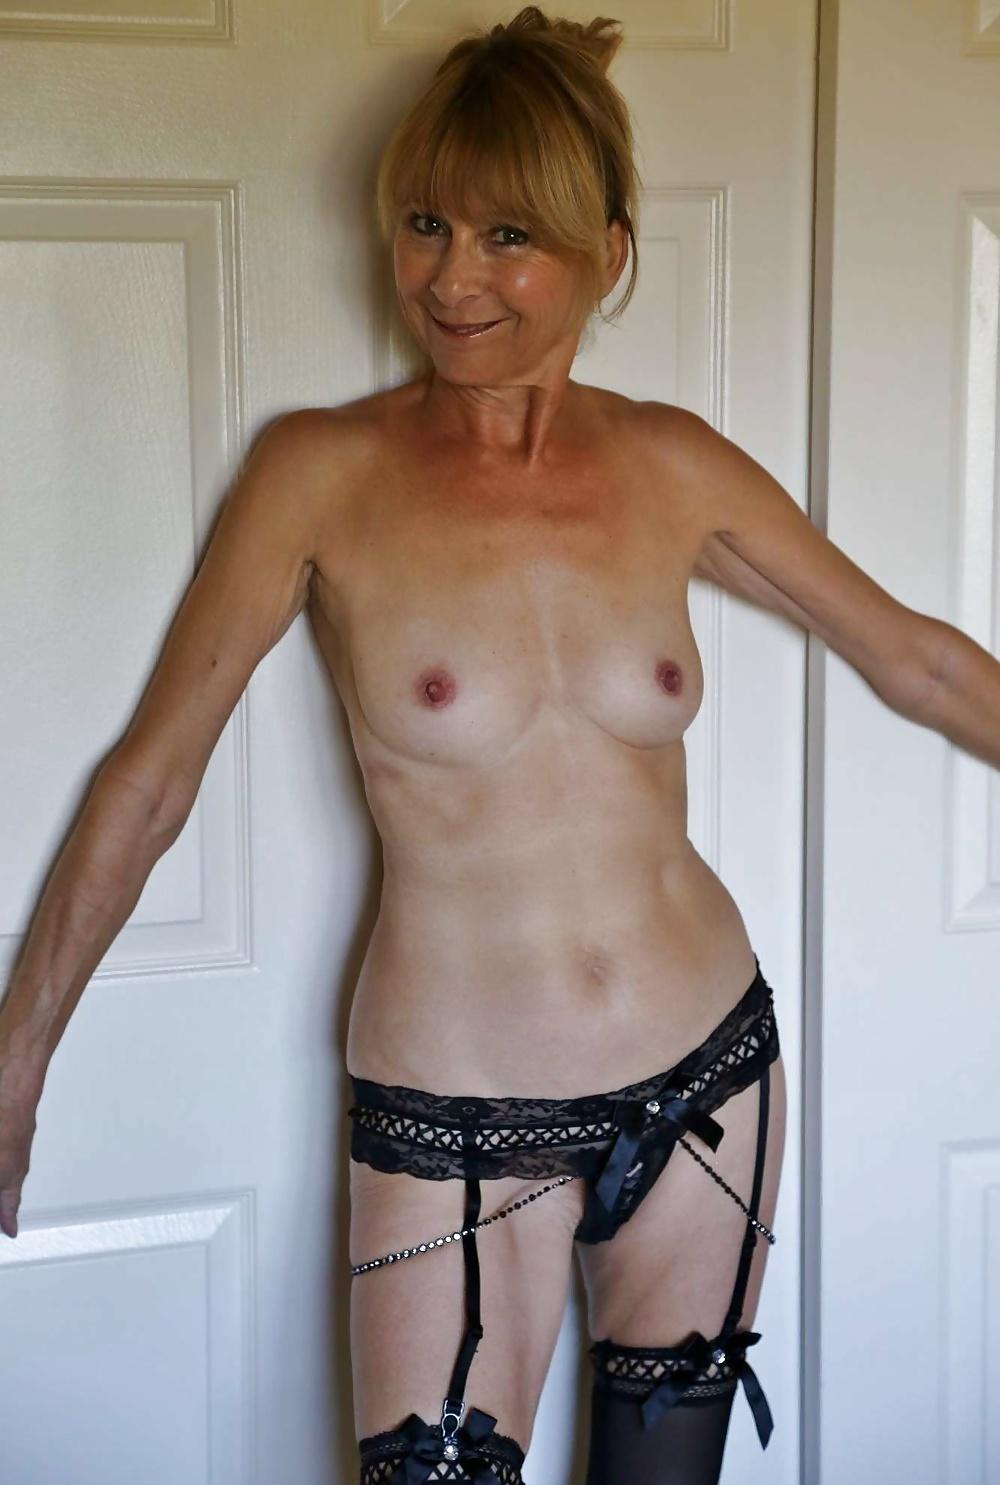 Stylish gilf nude, girls nacked ass